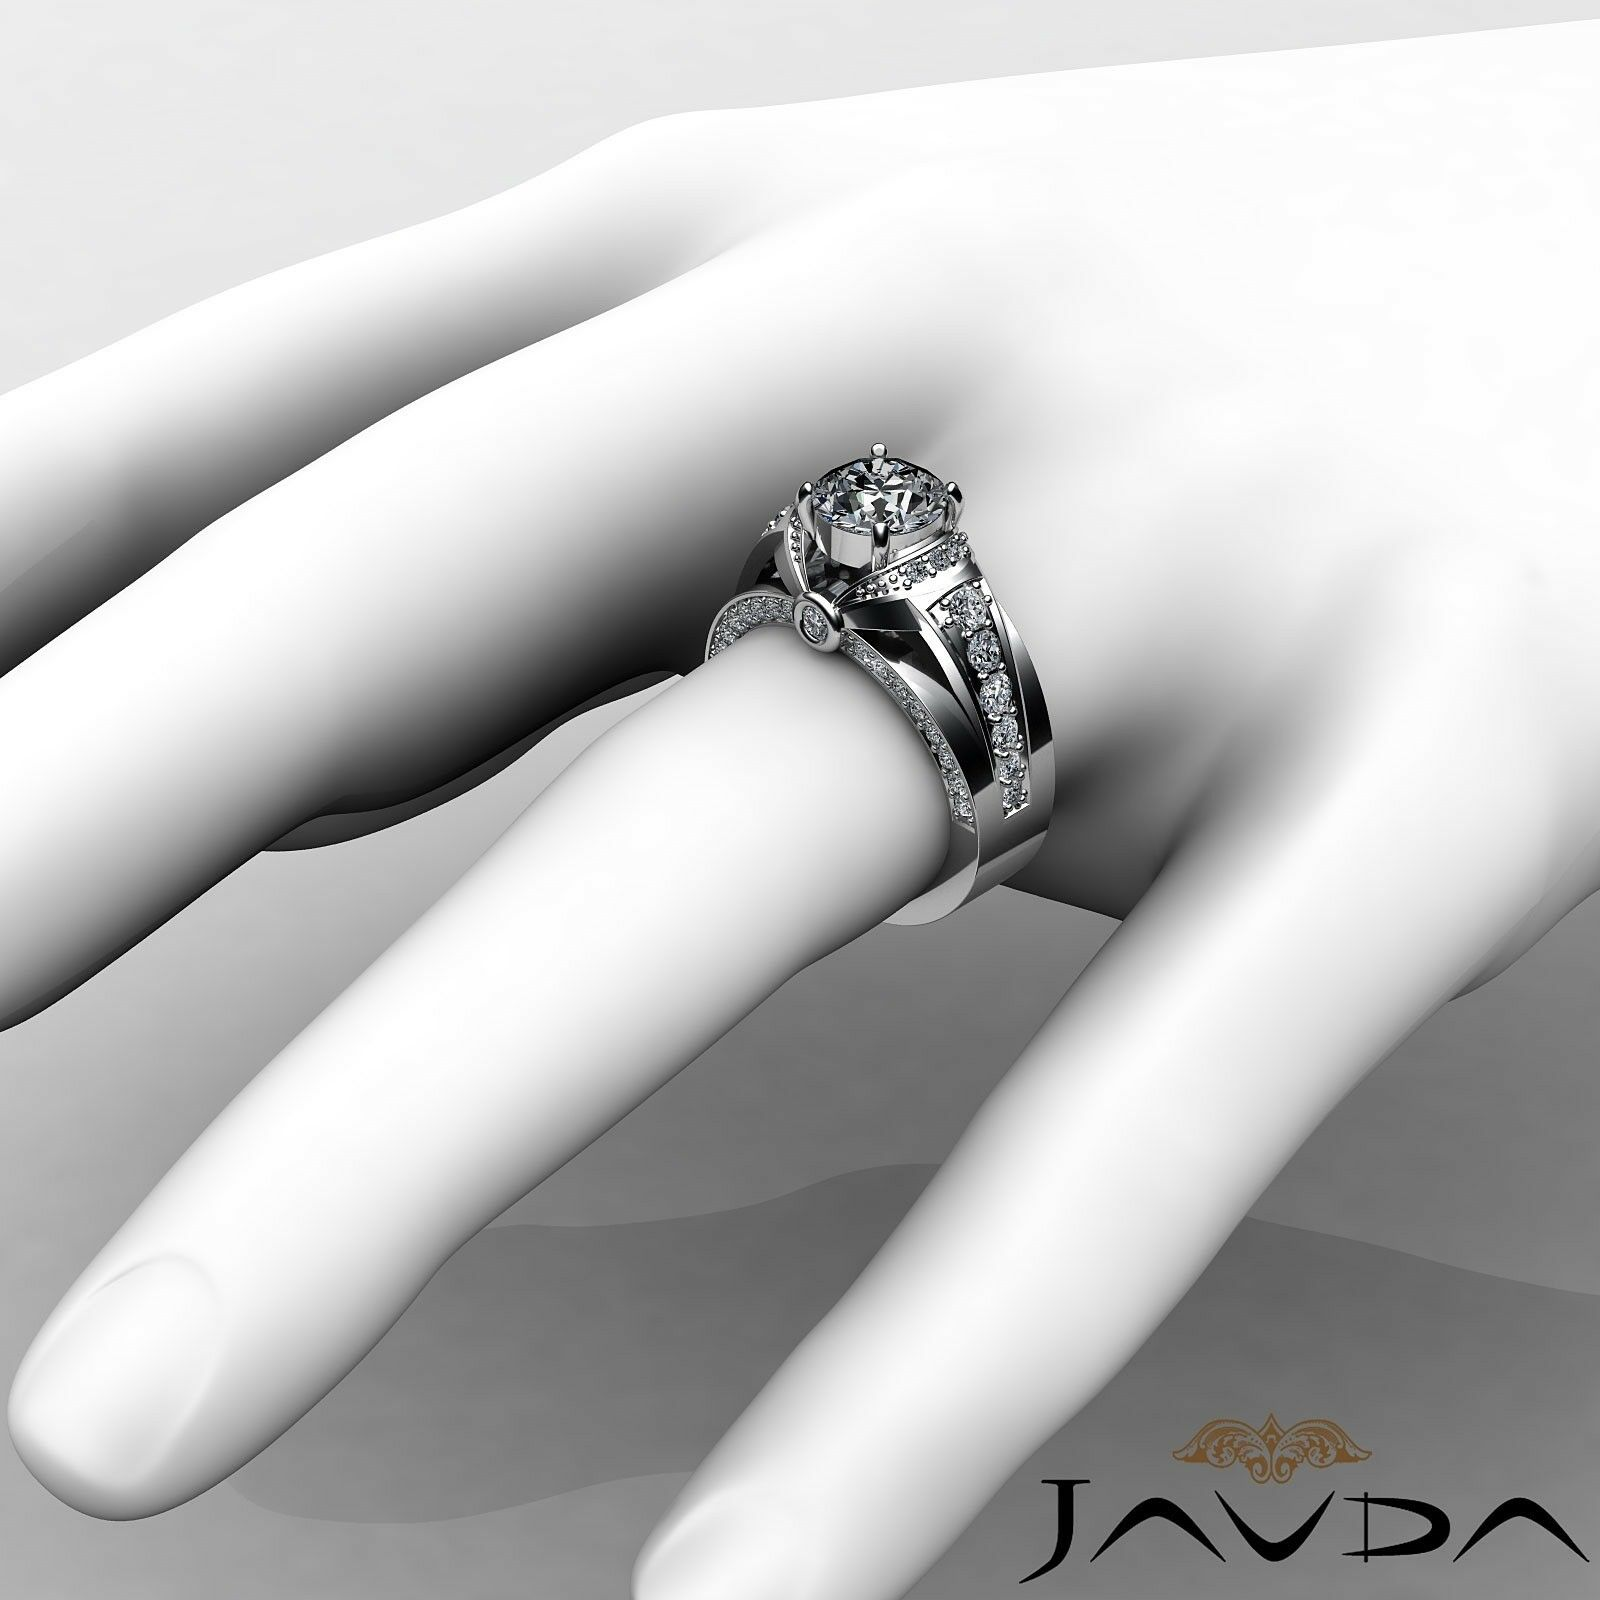 1.7ct Knot Classic Sidestone Round Diamond Engagement Ring GIA H-VVS2 White Gold 3